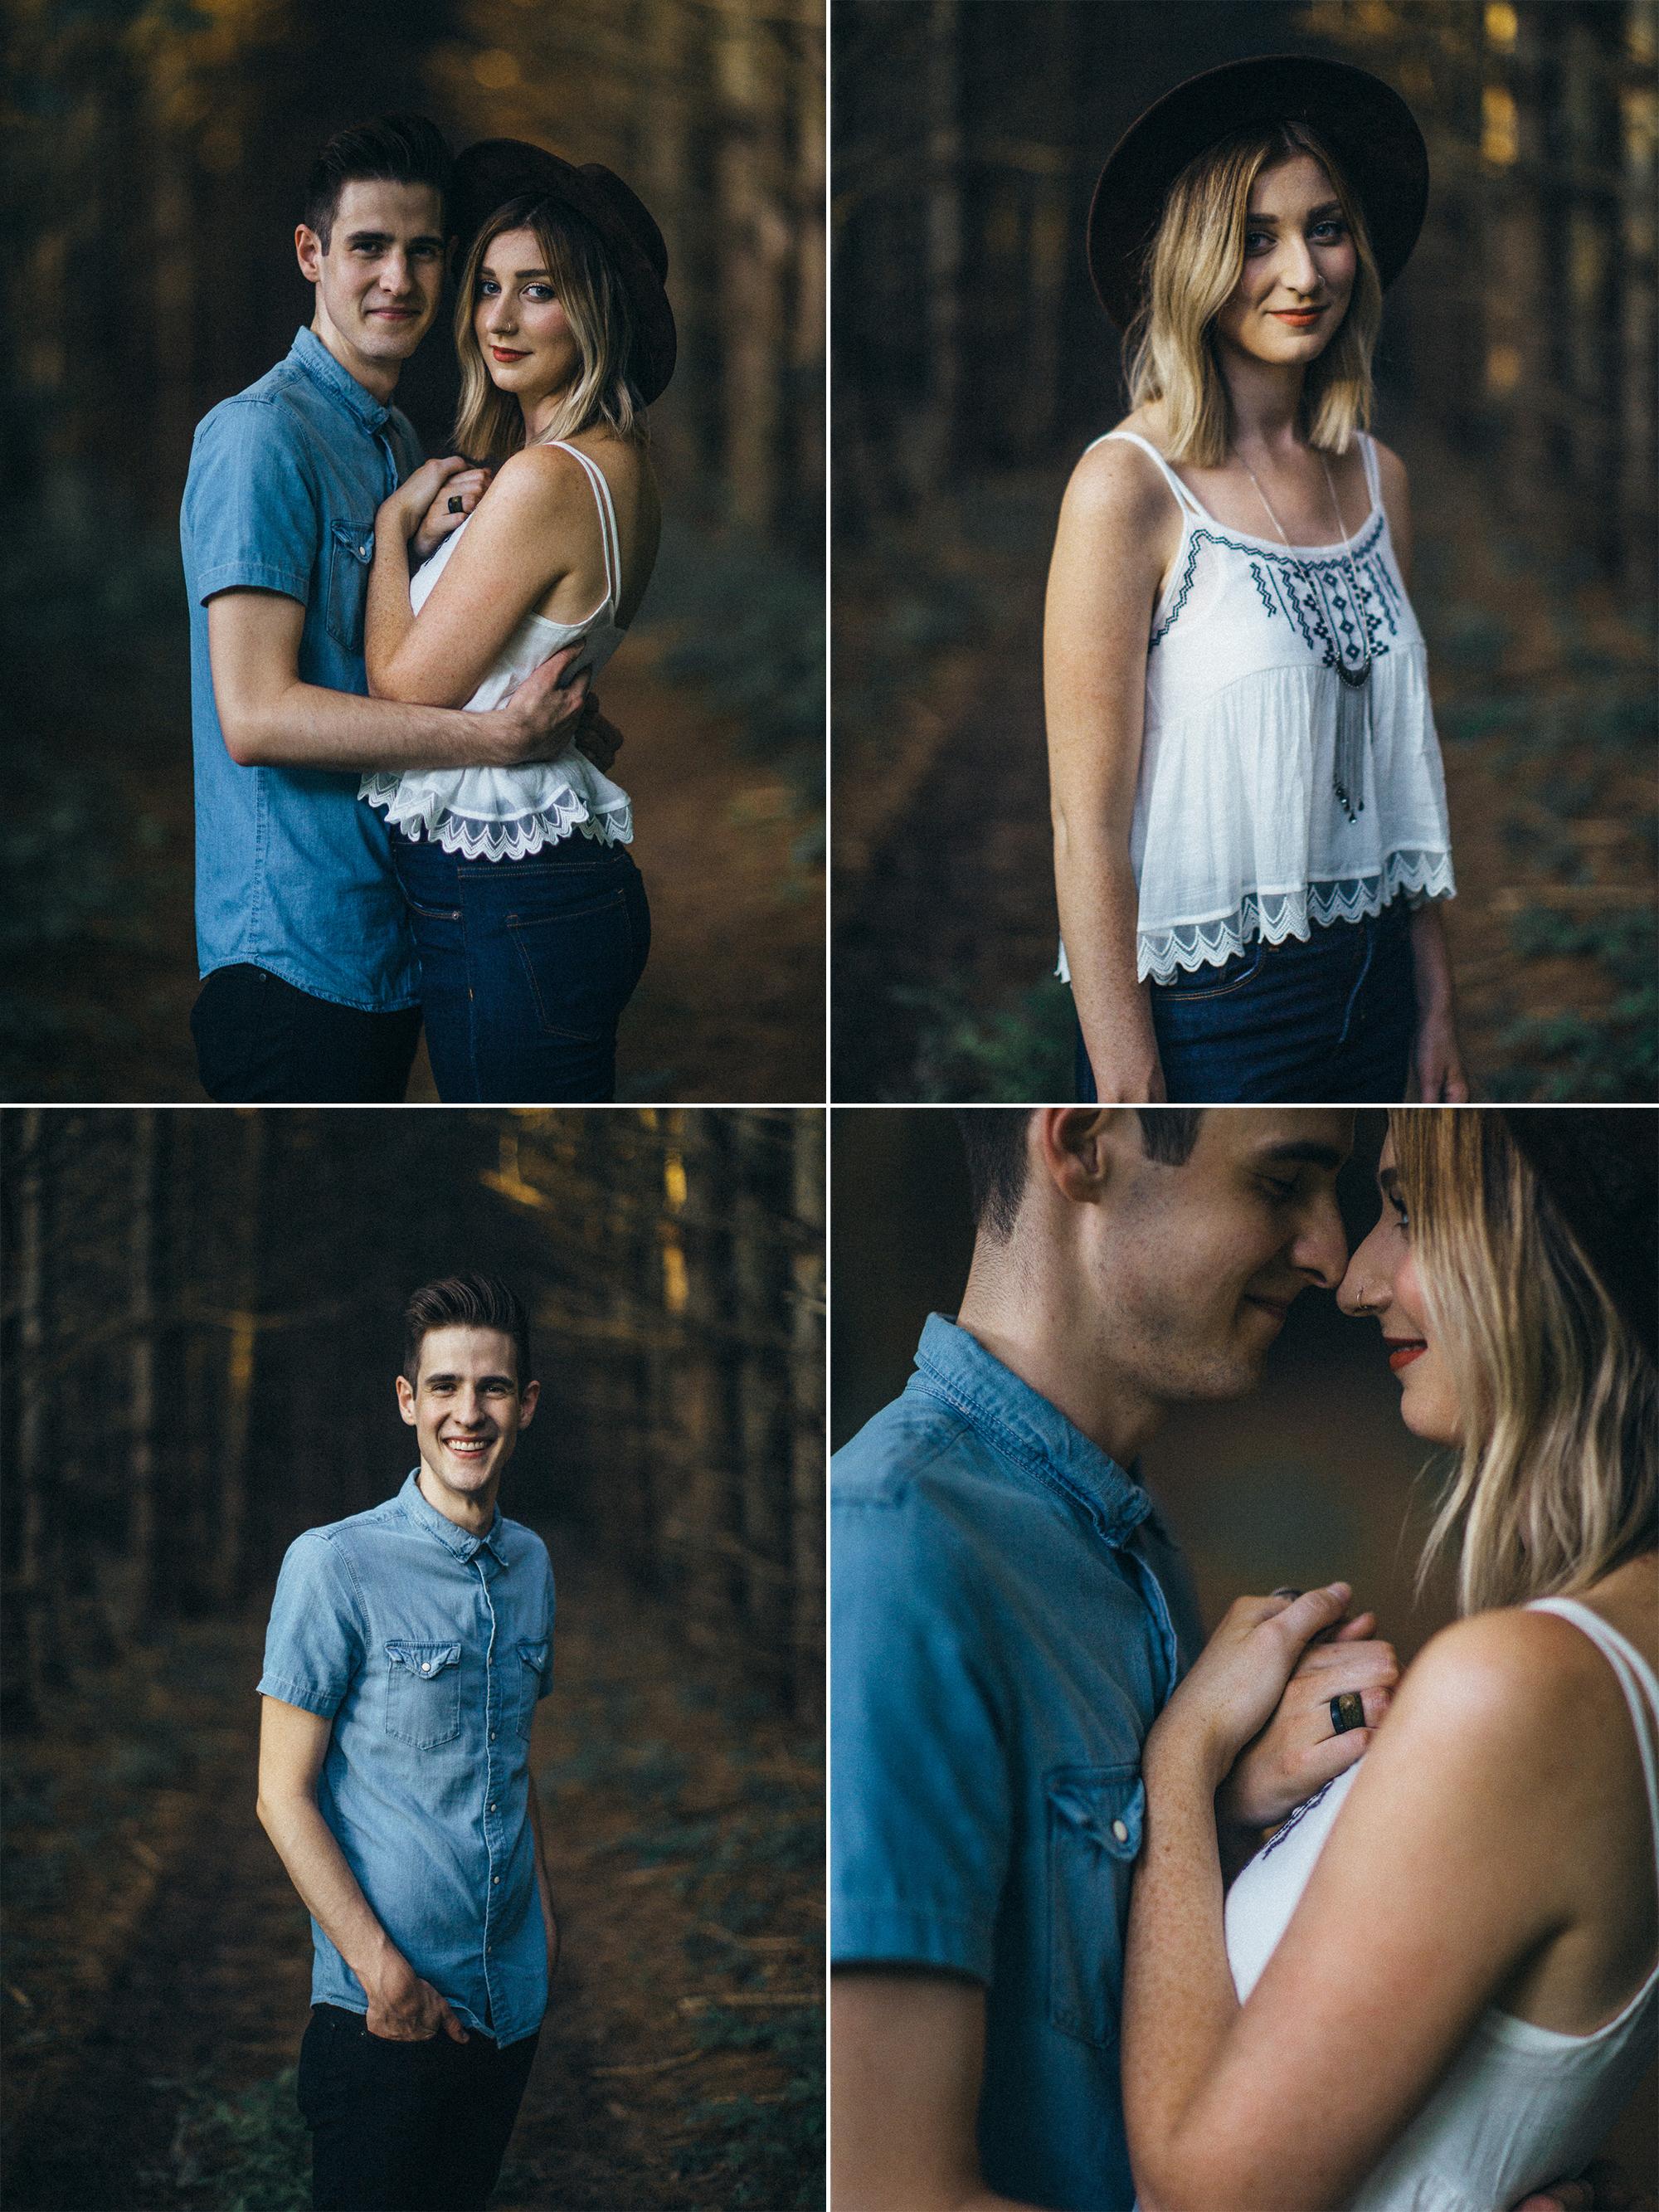 Addison & Rebekah Sauvan - Anniversary Portraits by Rusty Wright